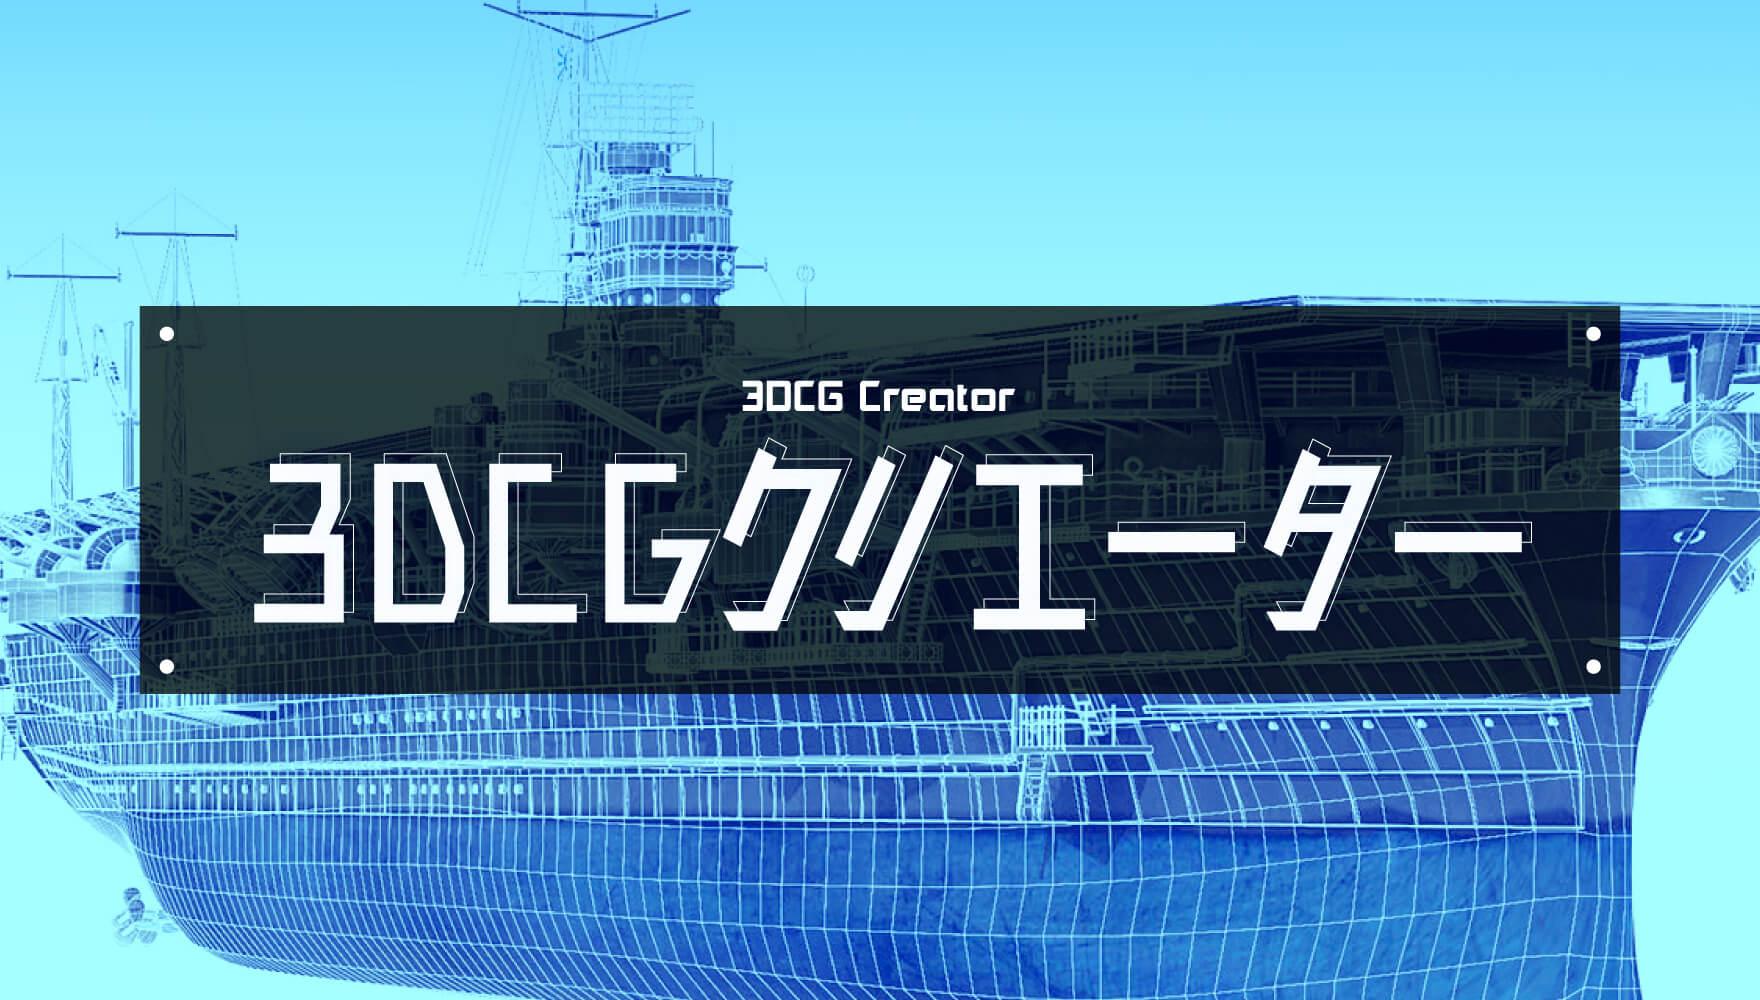 3dcg_cre